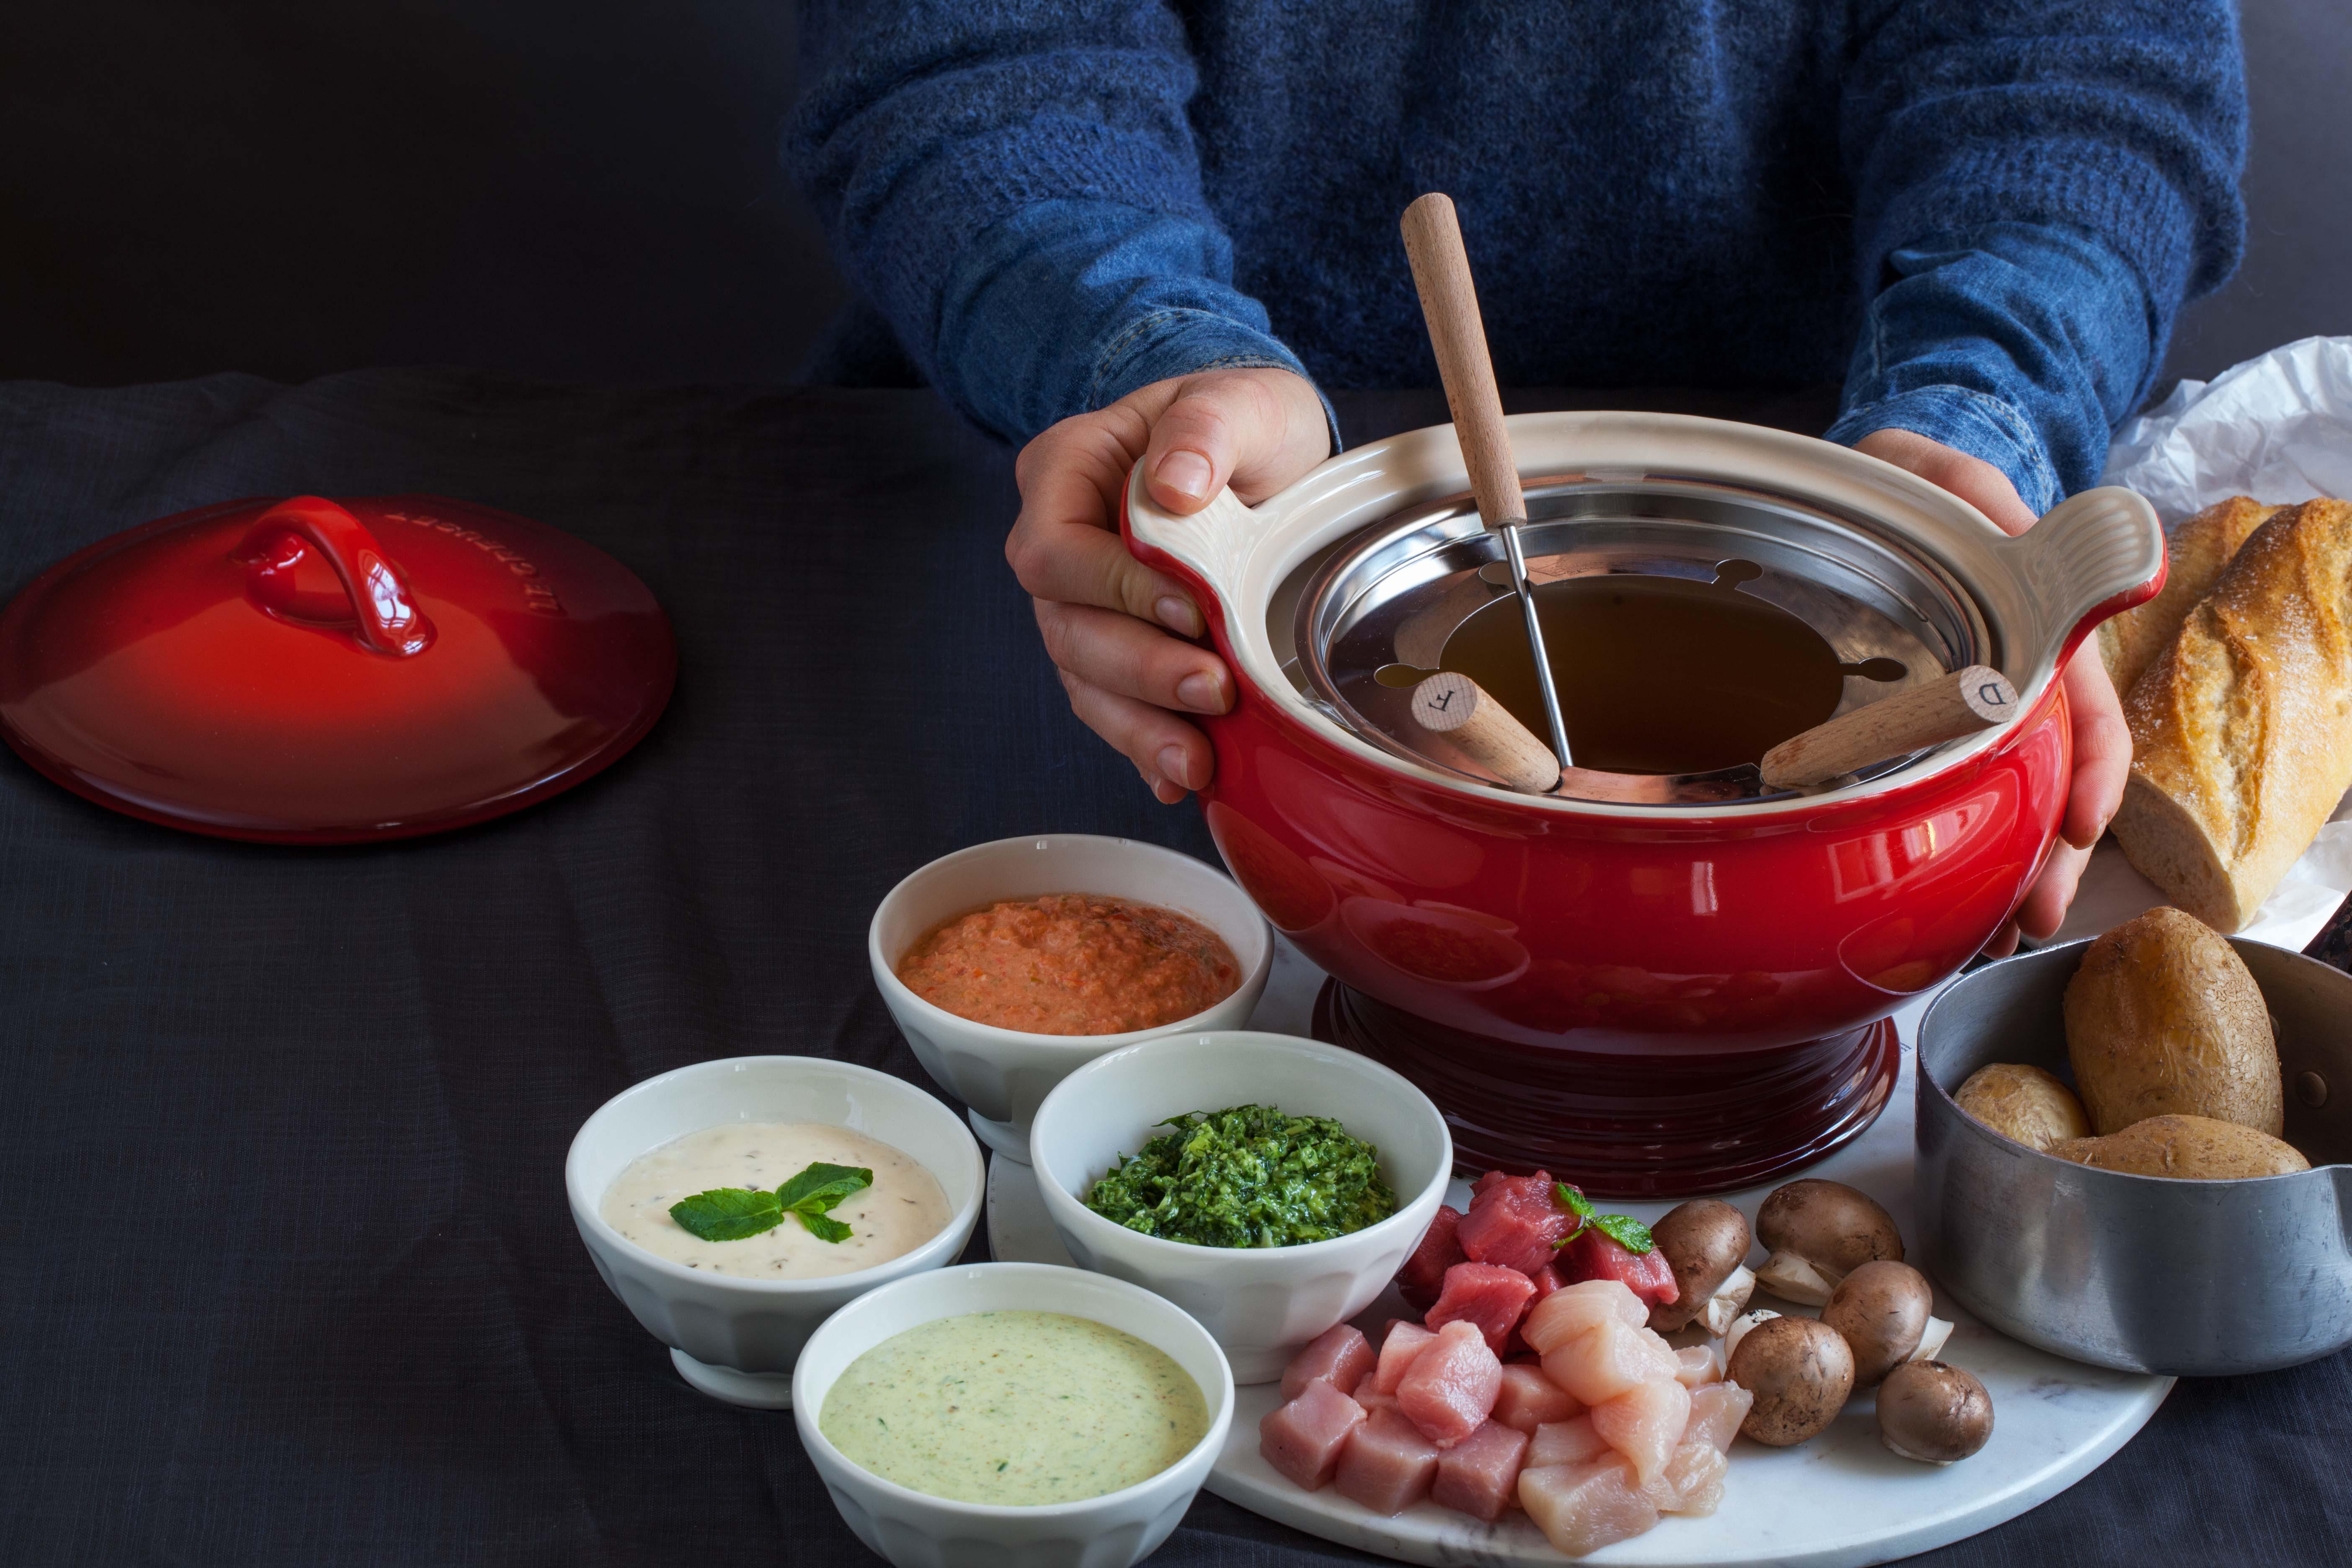 fleisch fondue oder hot pot zu weihnachten foodtastic. Black Bedroom Furniture Sets. Home Design Ideas